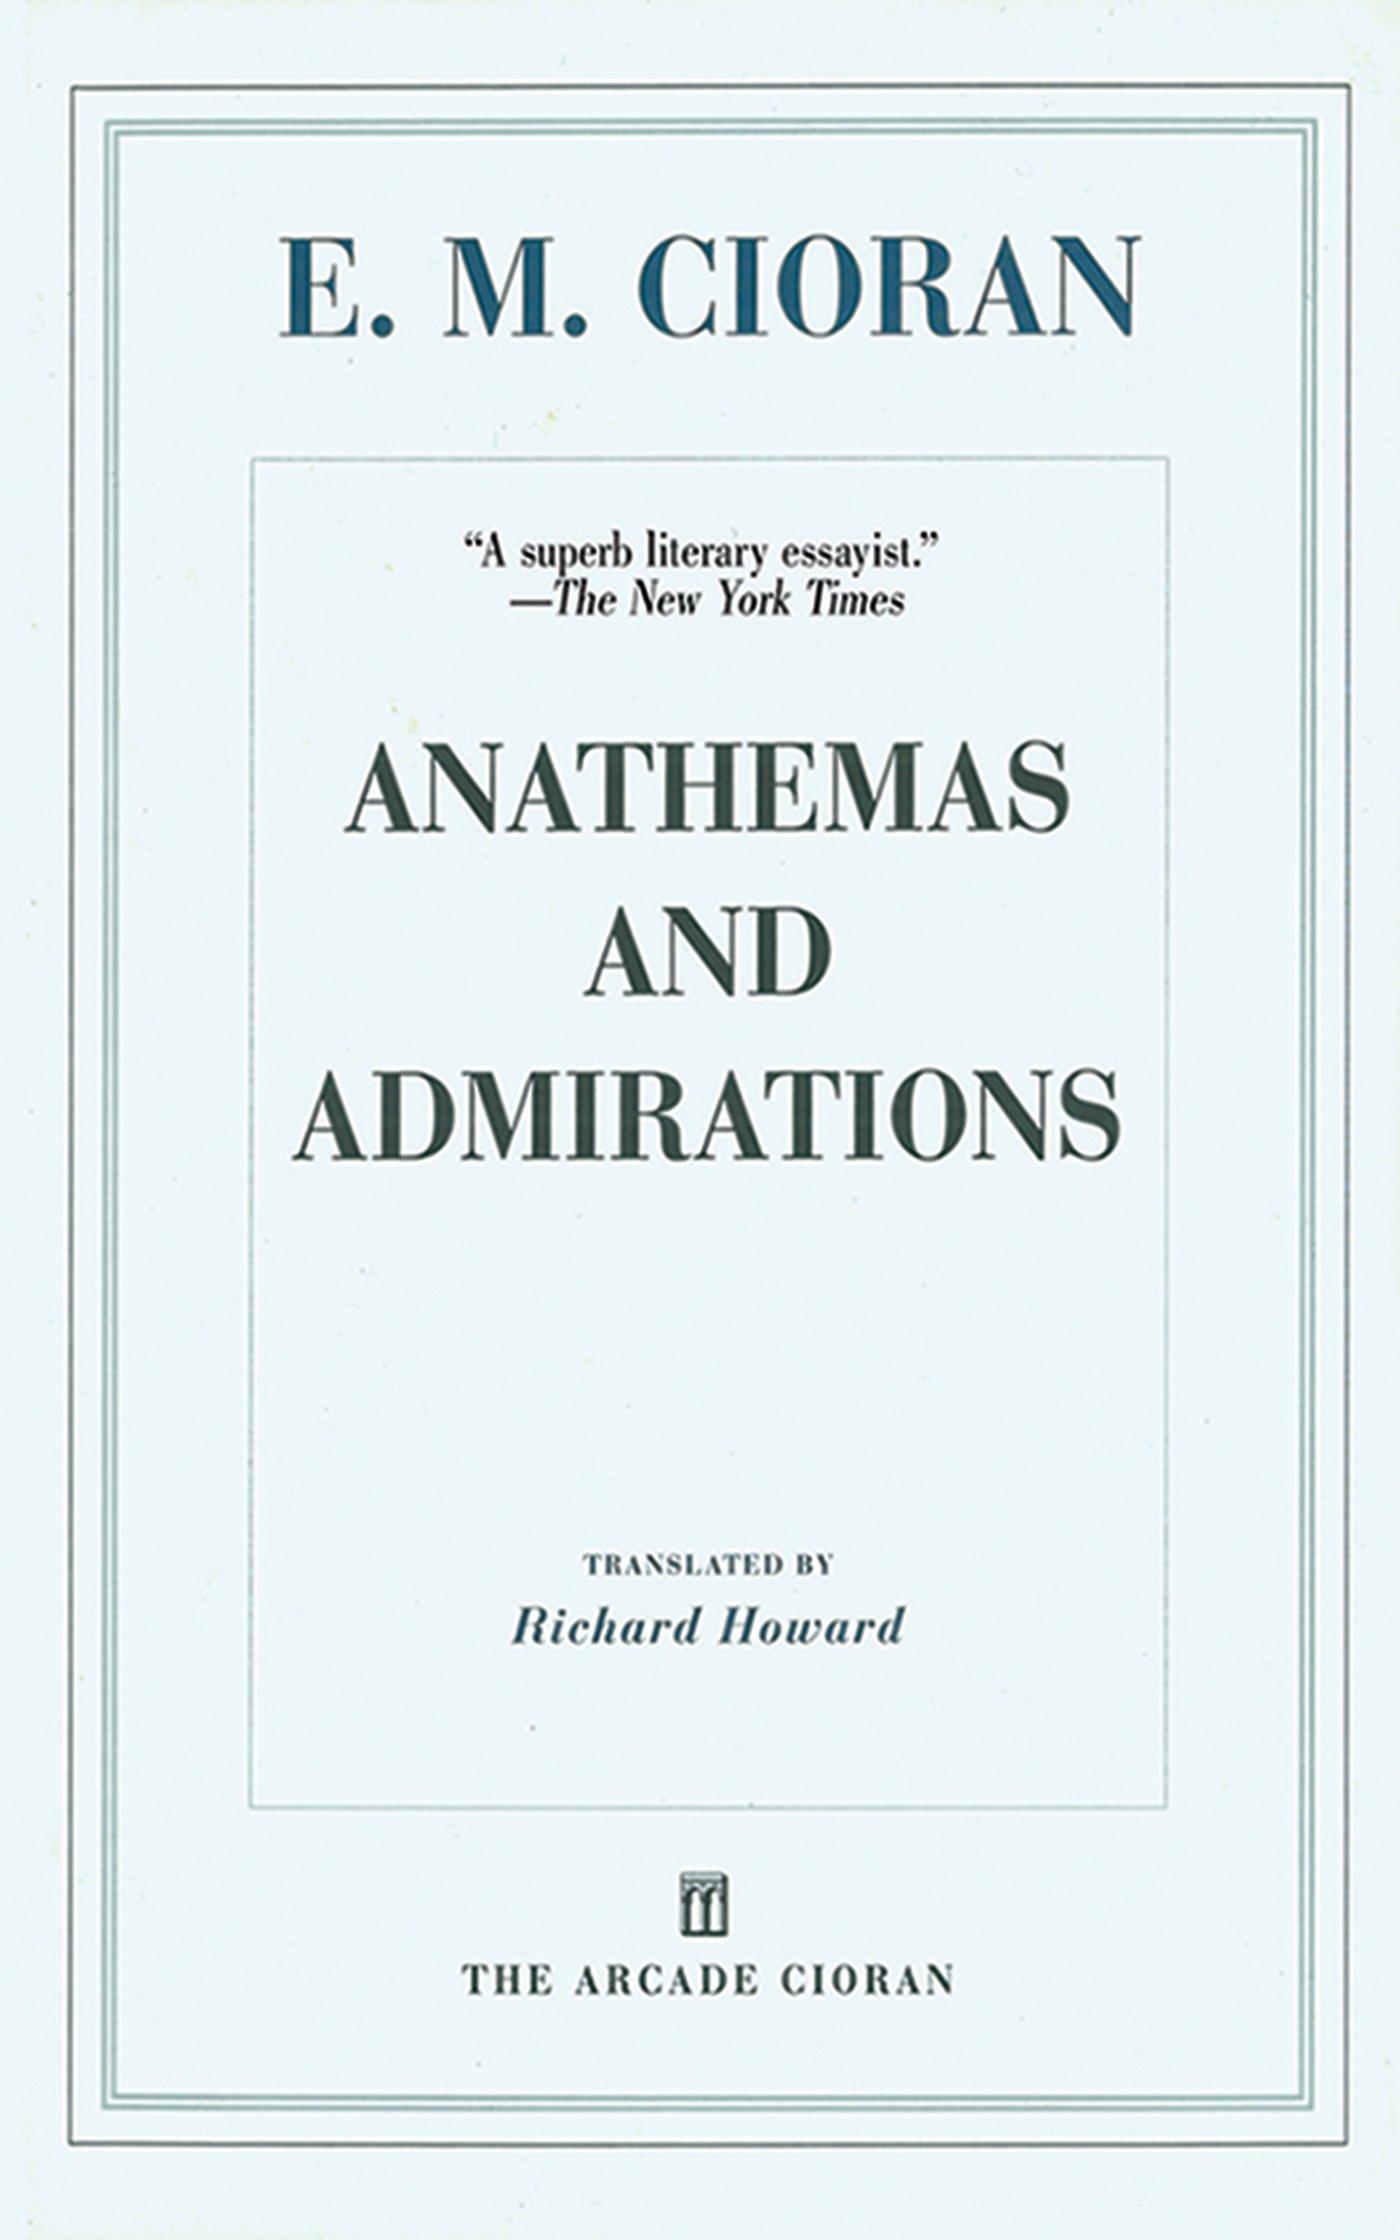 ANATHEMAS AND ADMIRATIONS EPUB